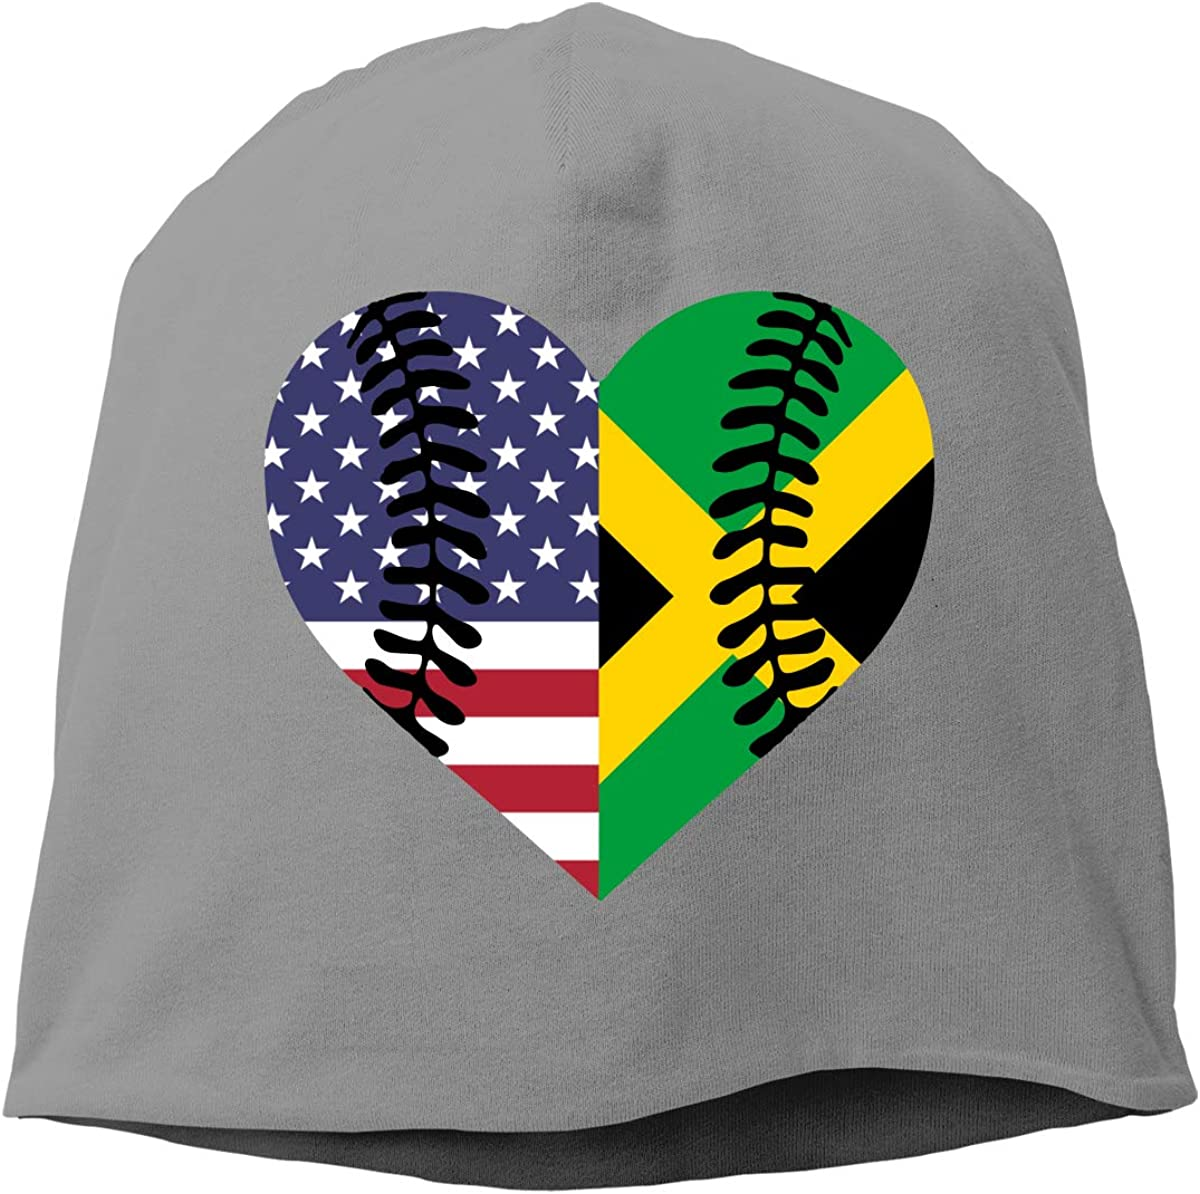 Winter Warm Knit Hat Bahamas Flag Baseball in My DNA Beanie Skull Cap for Women and Men